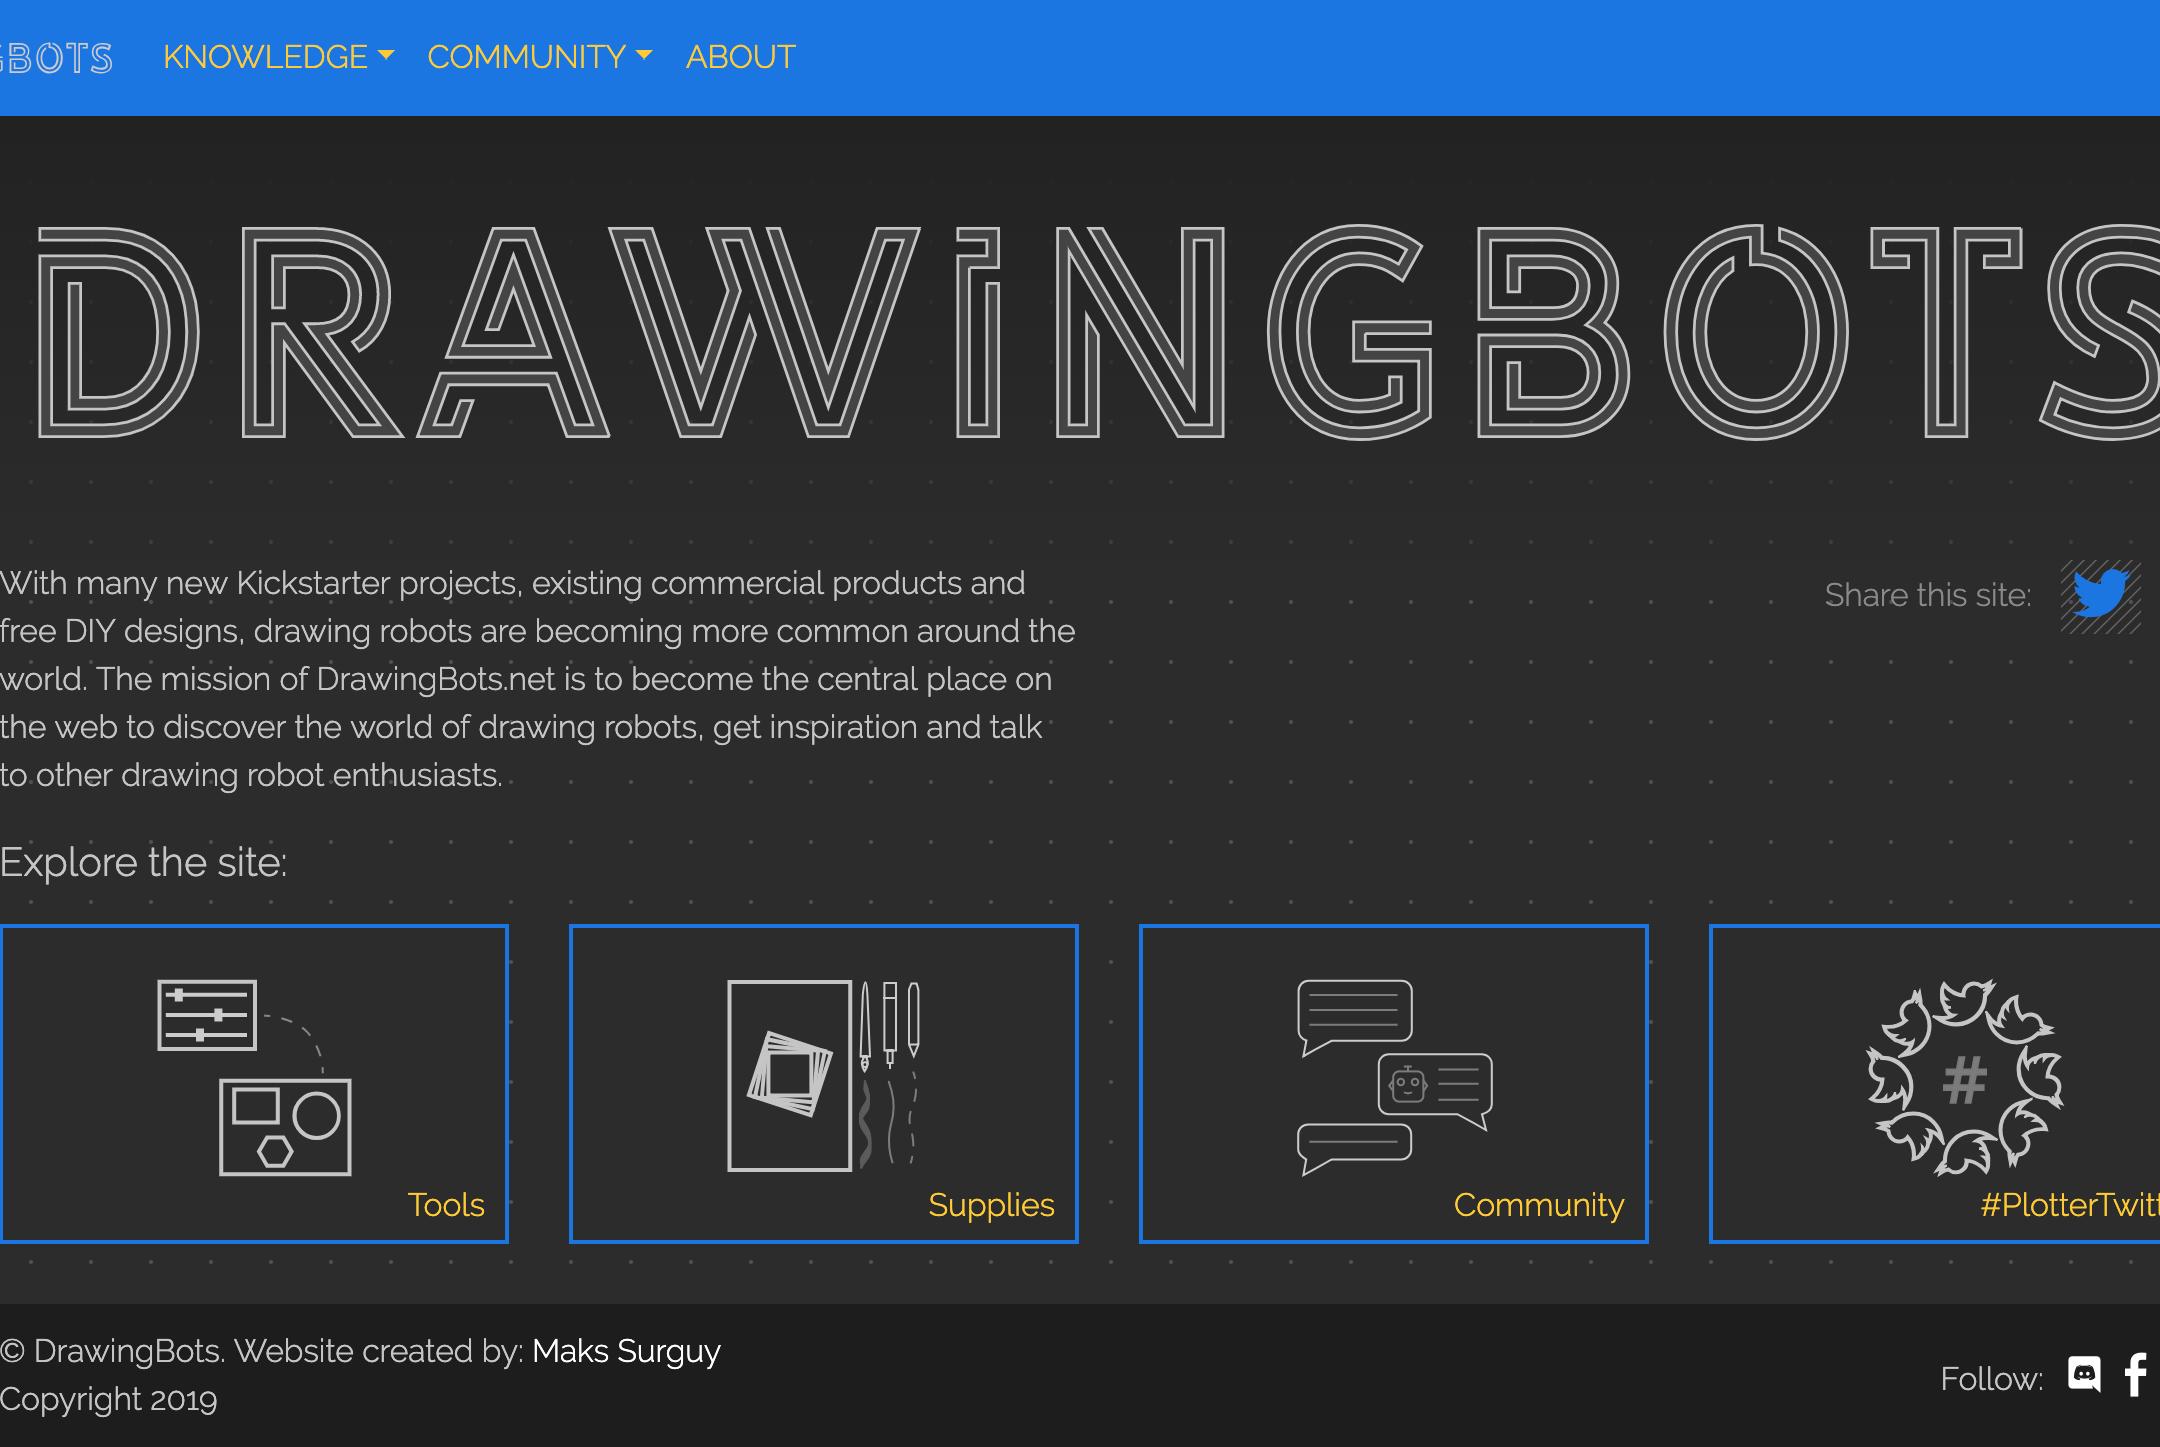 Drawingbots net Home